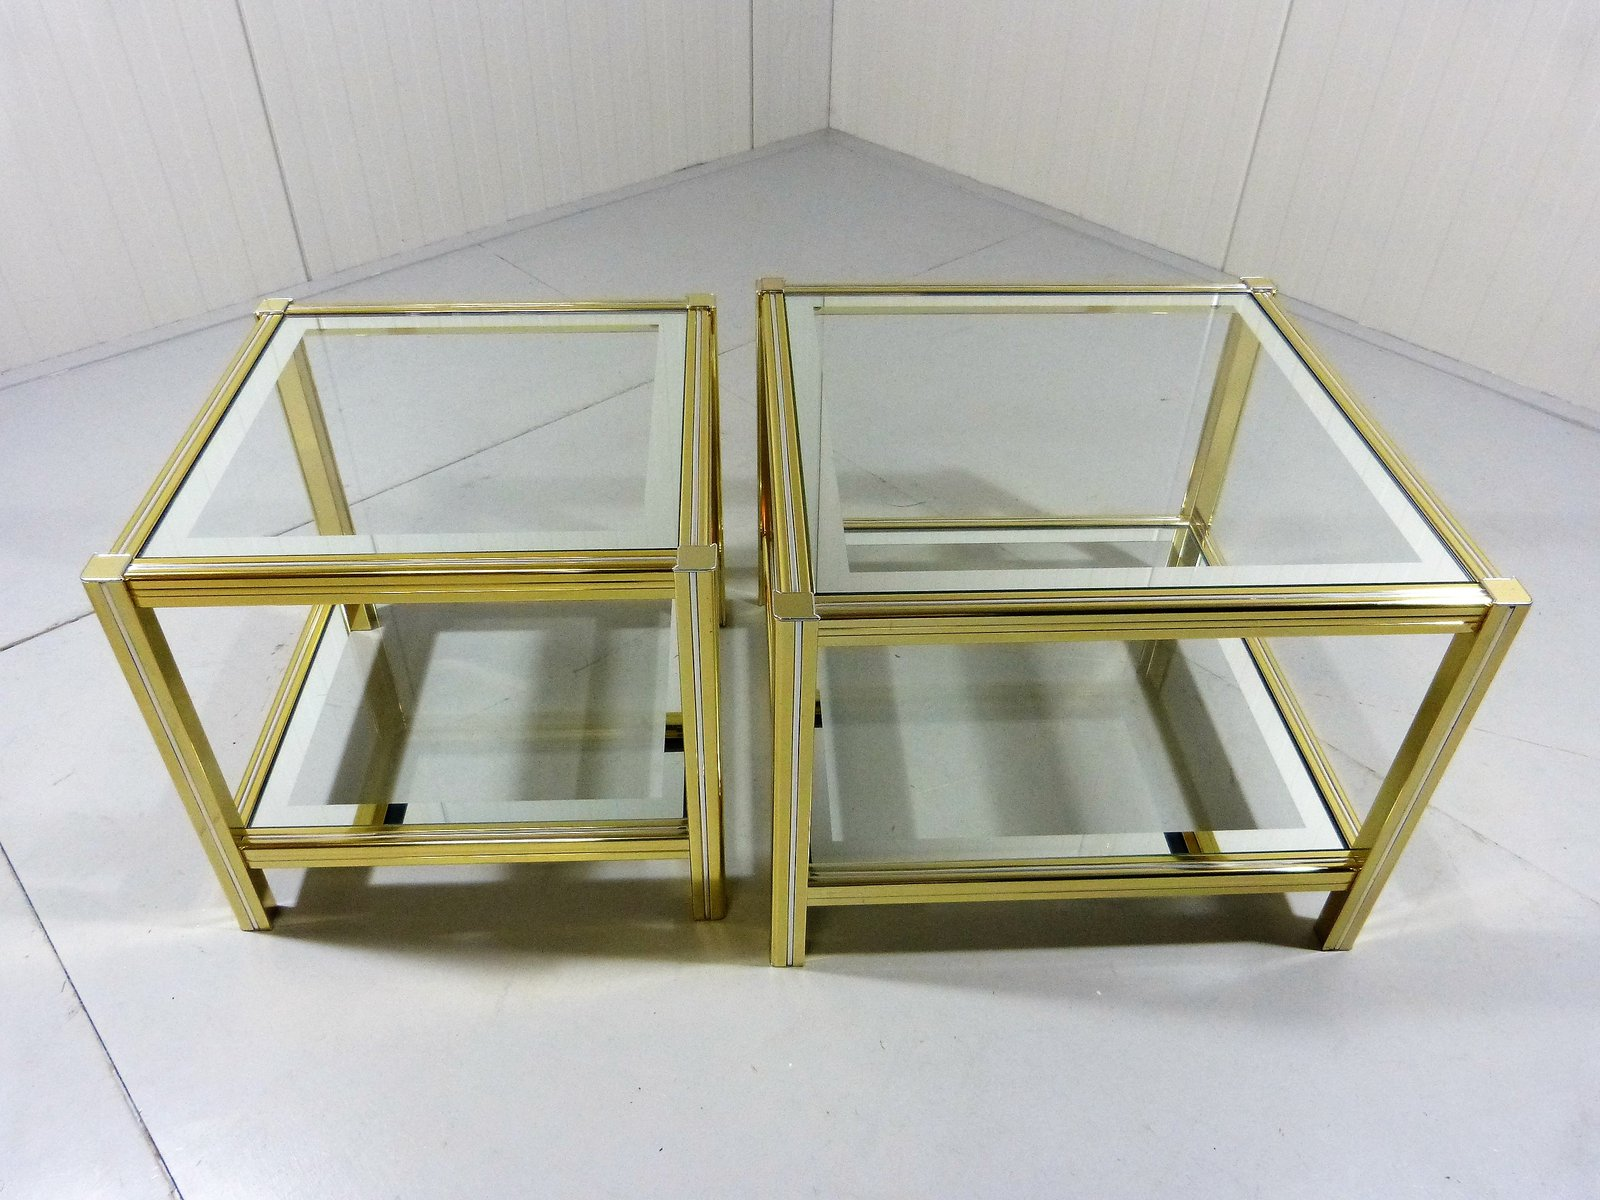 Hollywood Regency Brass U0026 Chrome Side Tables, Set Of 2 For Sale At Pamono